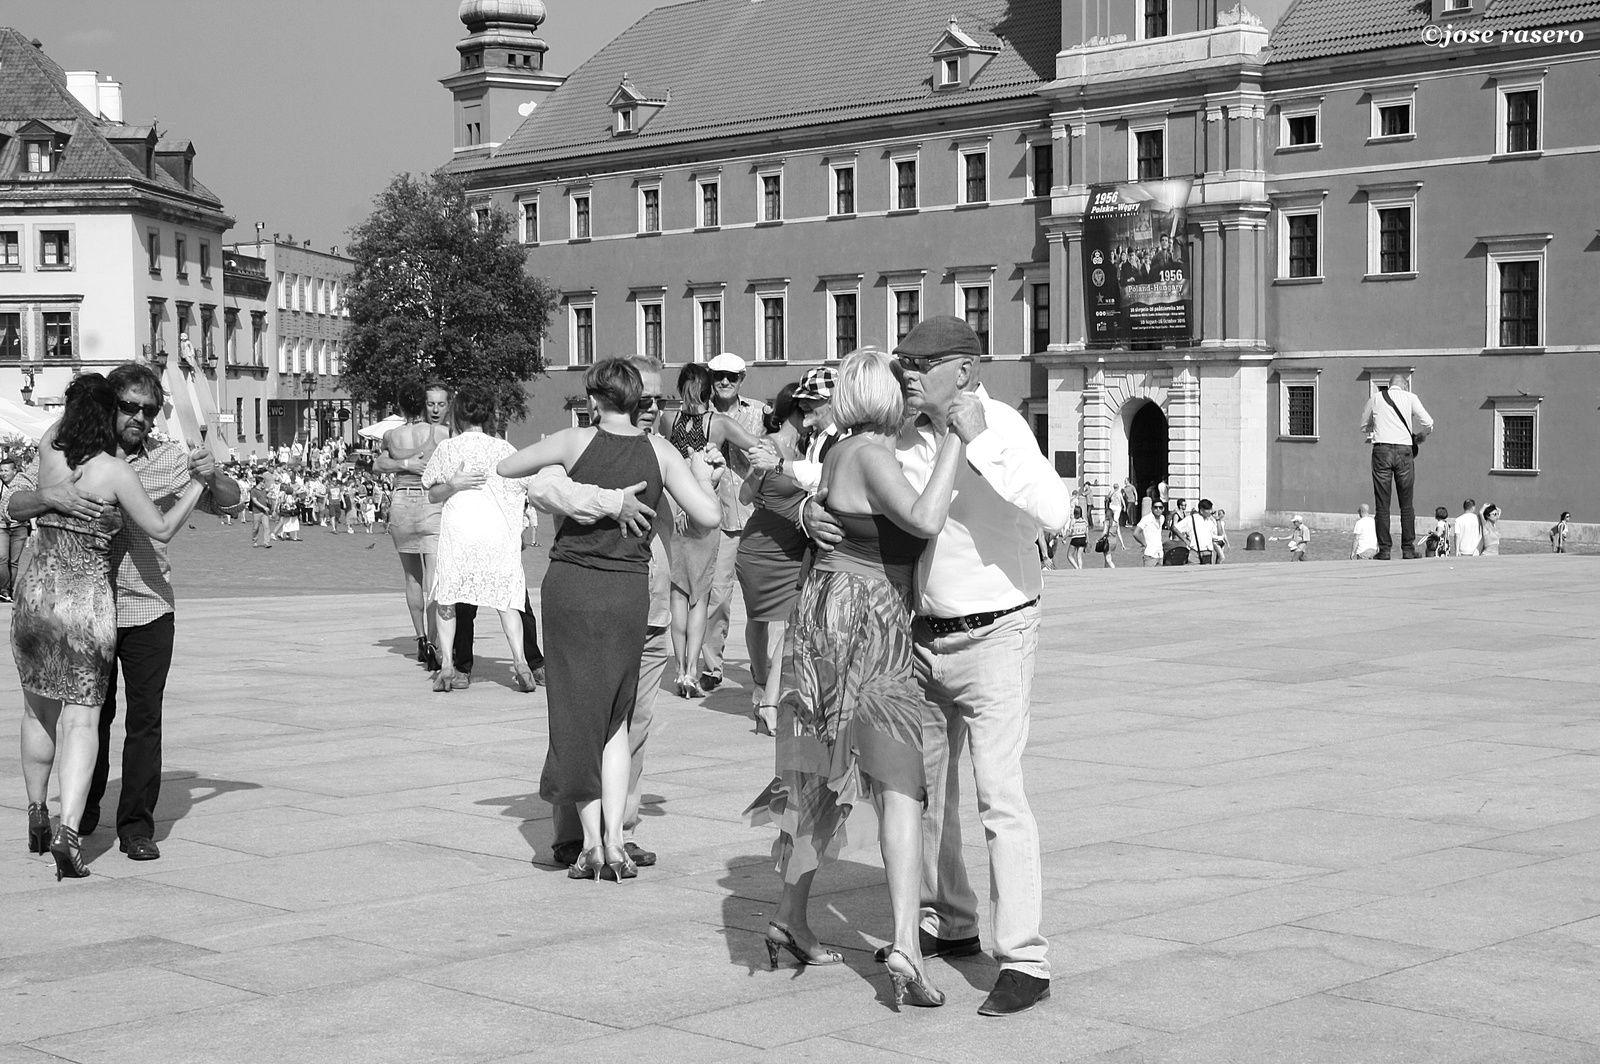 Dancing in Old Town, 1 (Varsovia)